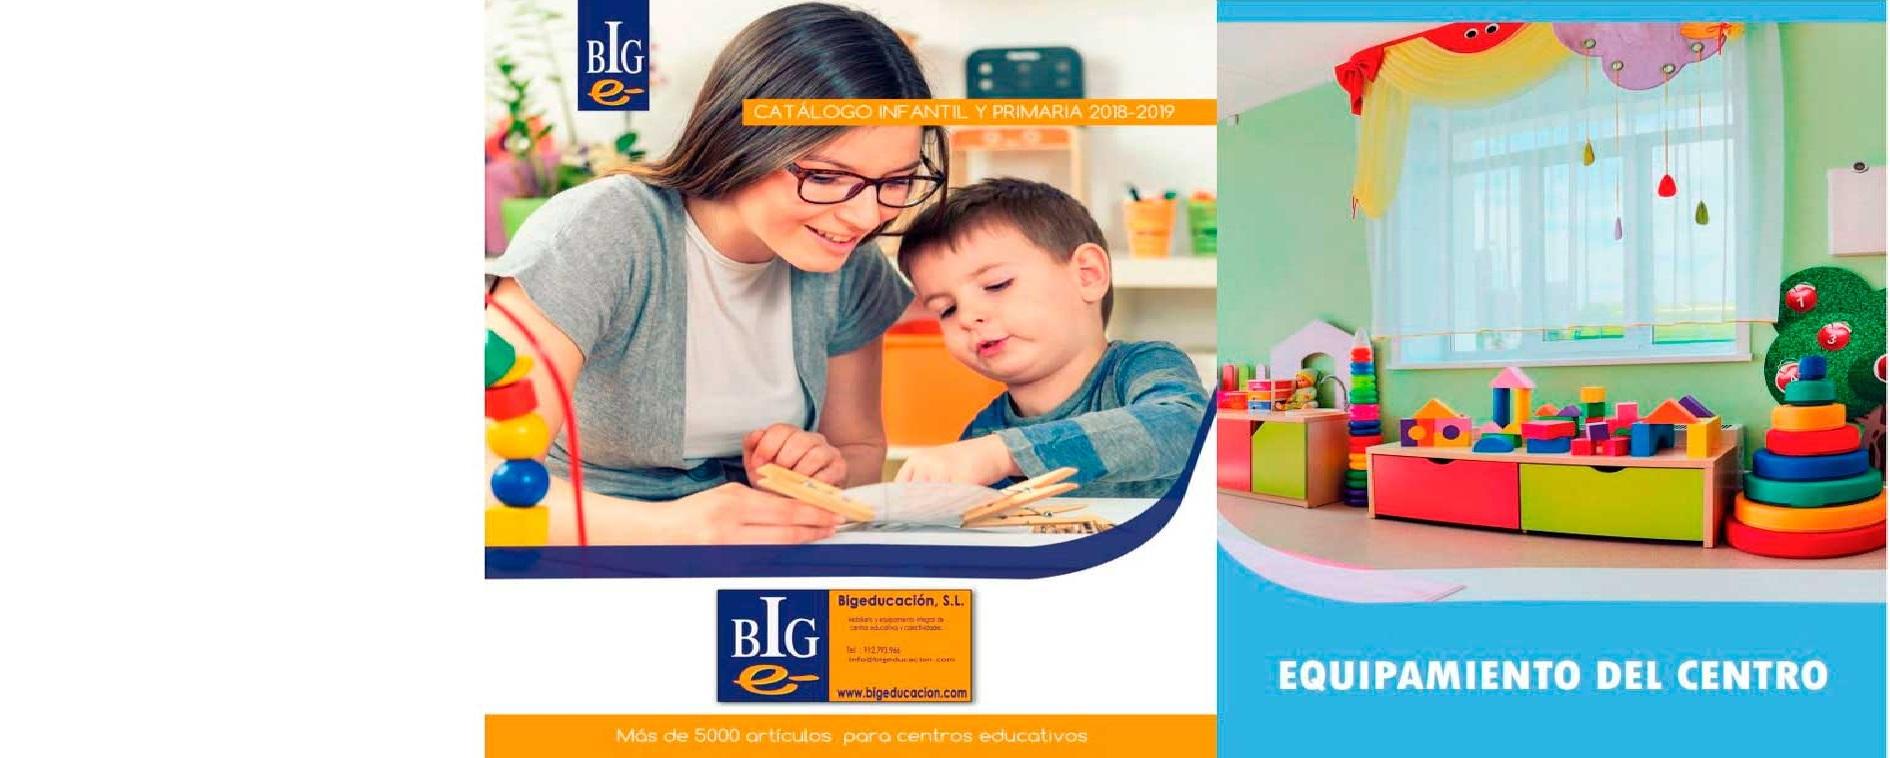 Catalogo infantil y primaria